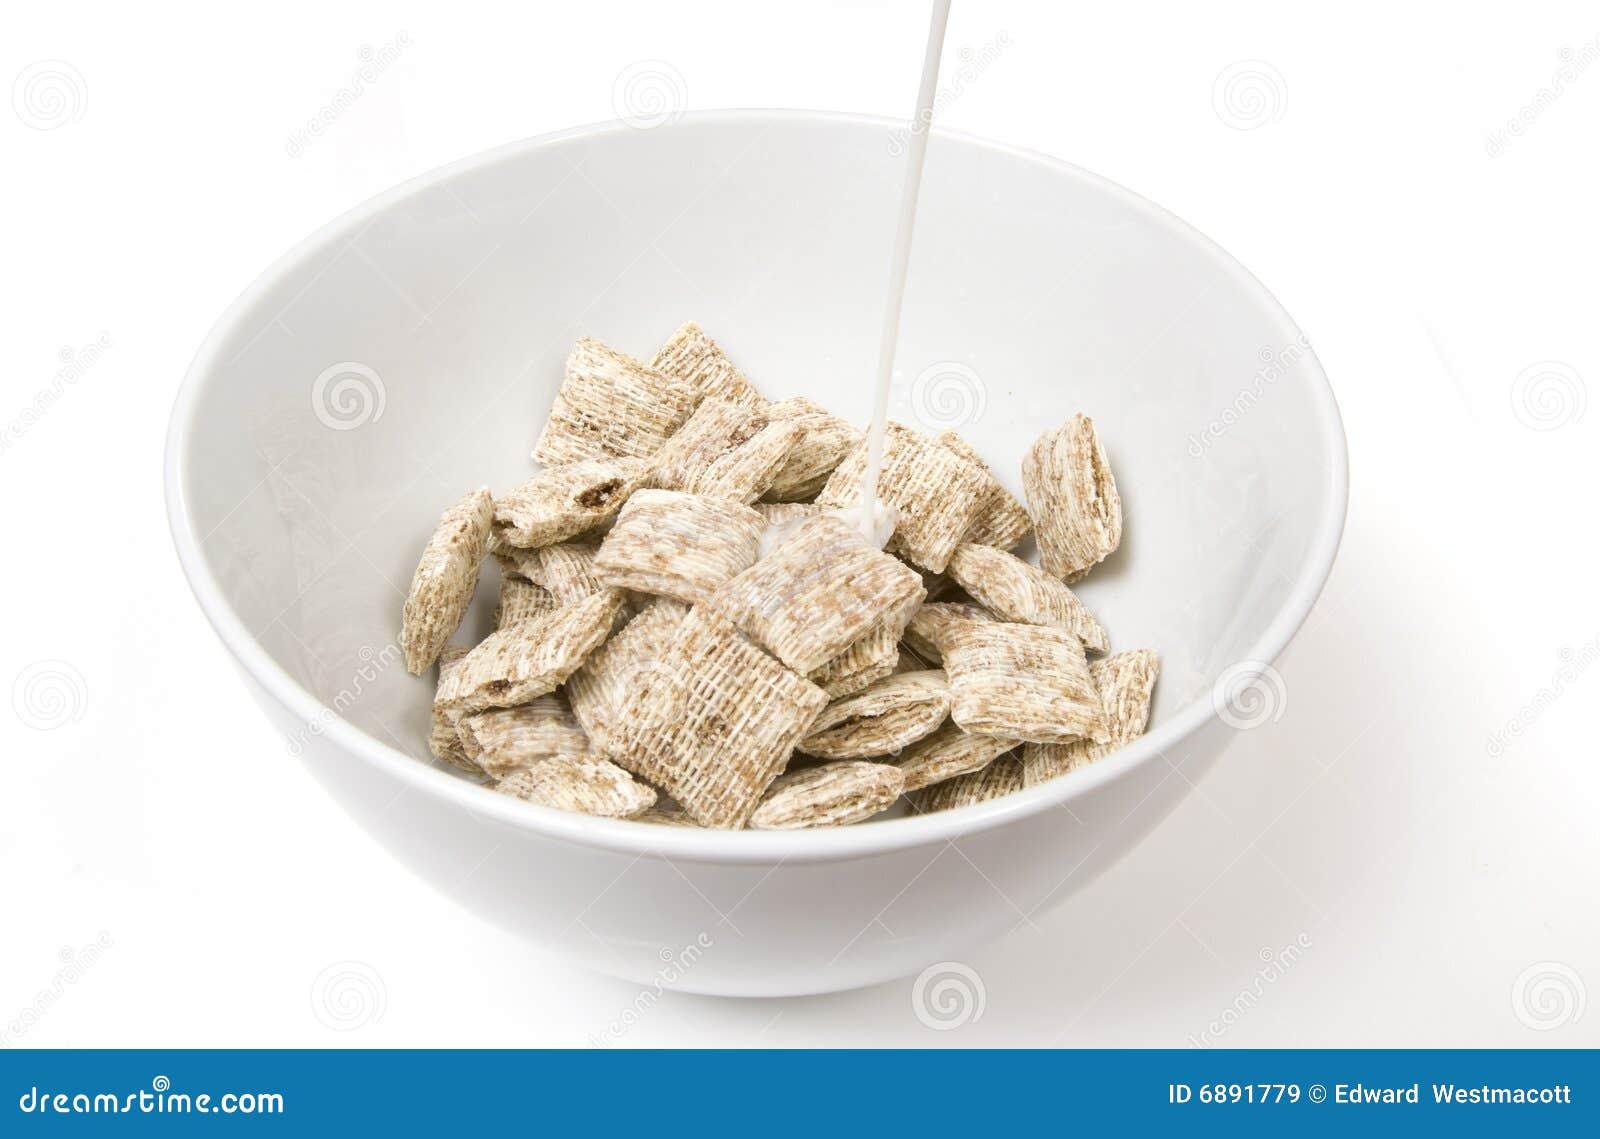 WeizenFrühstückskost aus Getreide